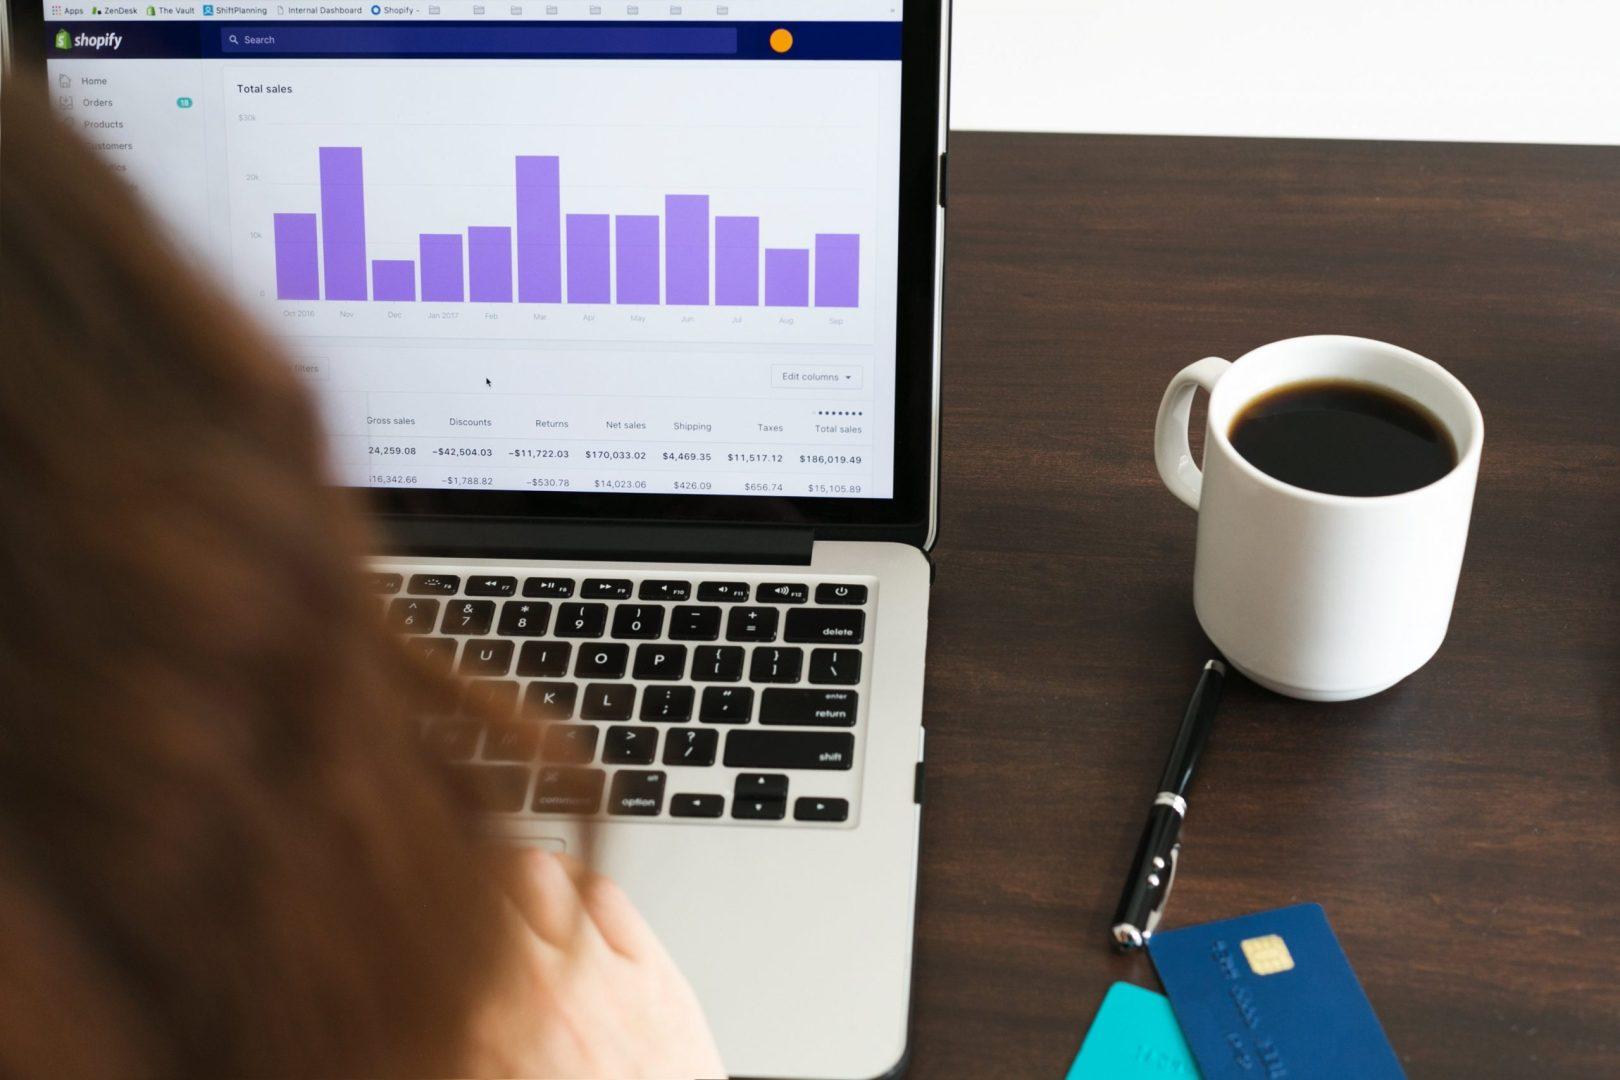 Checking shopify sales data